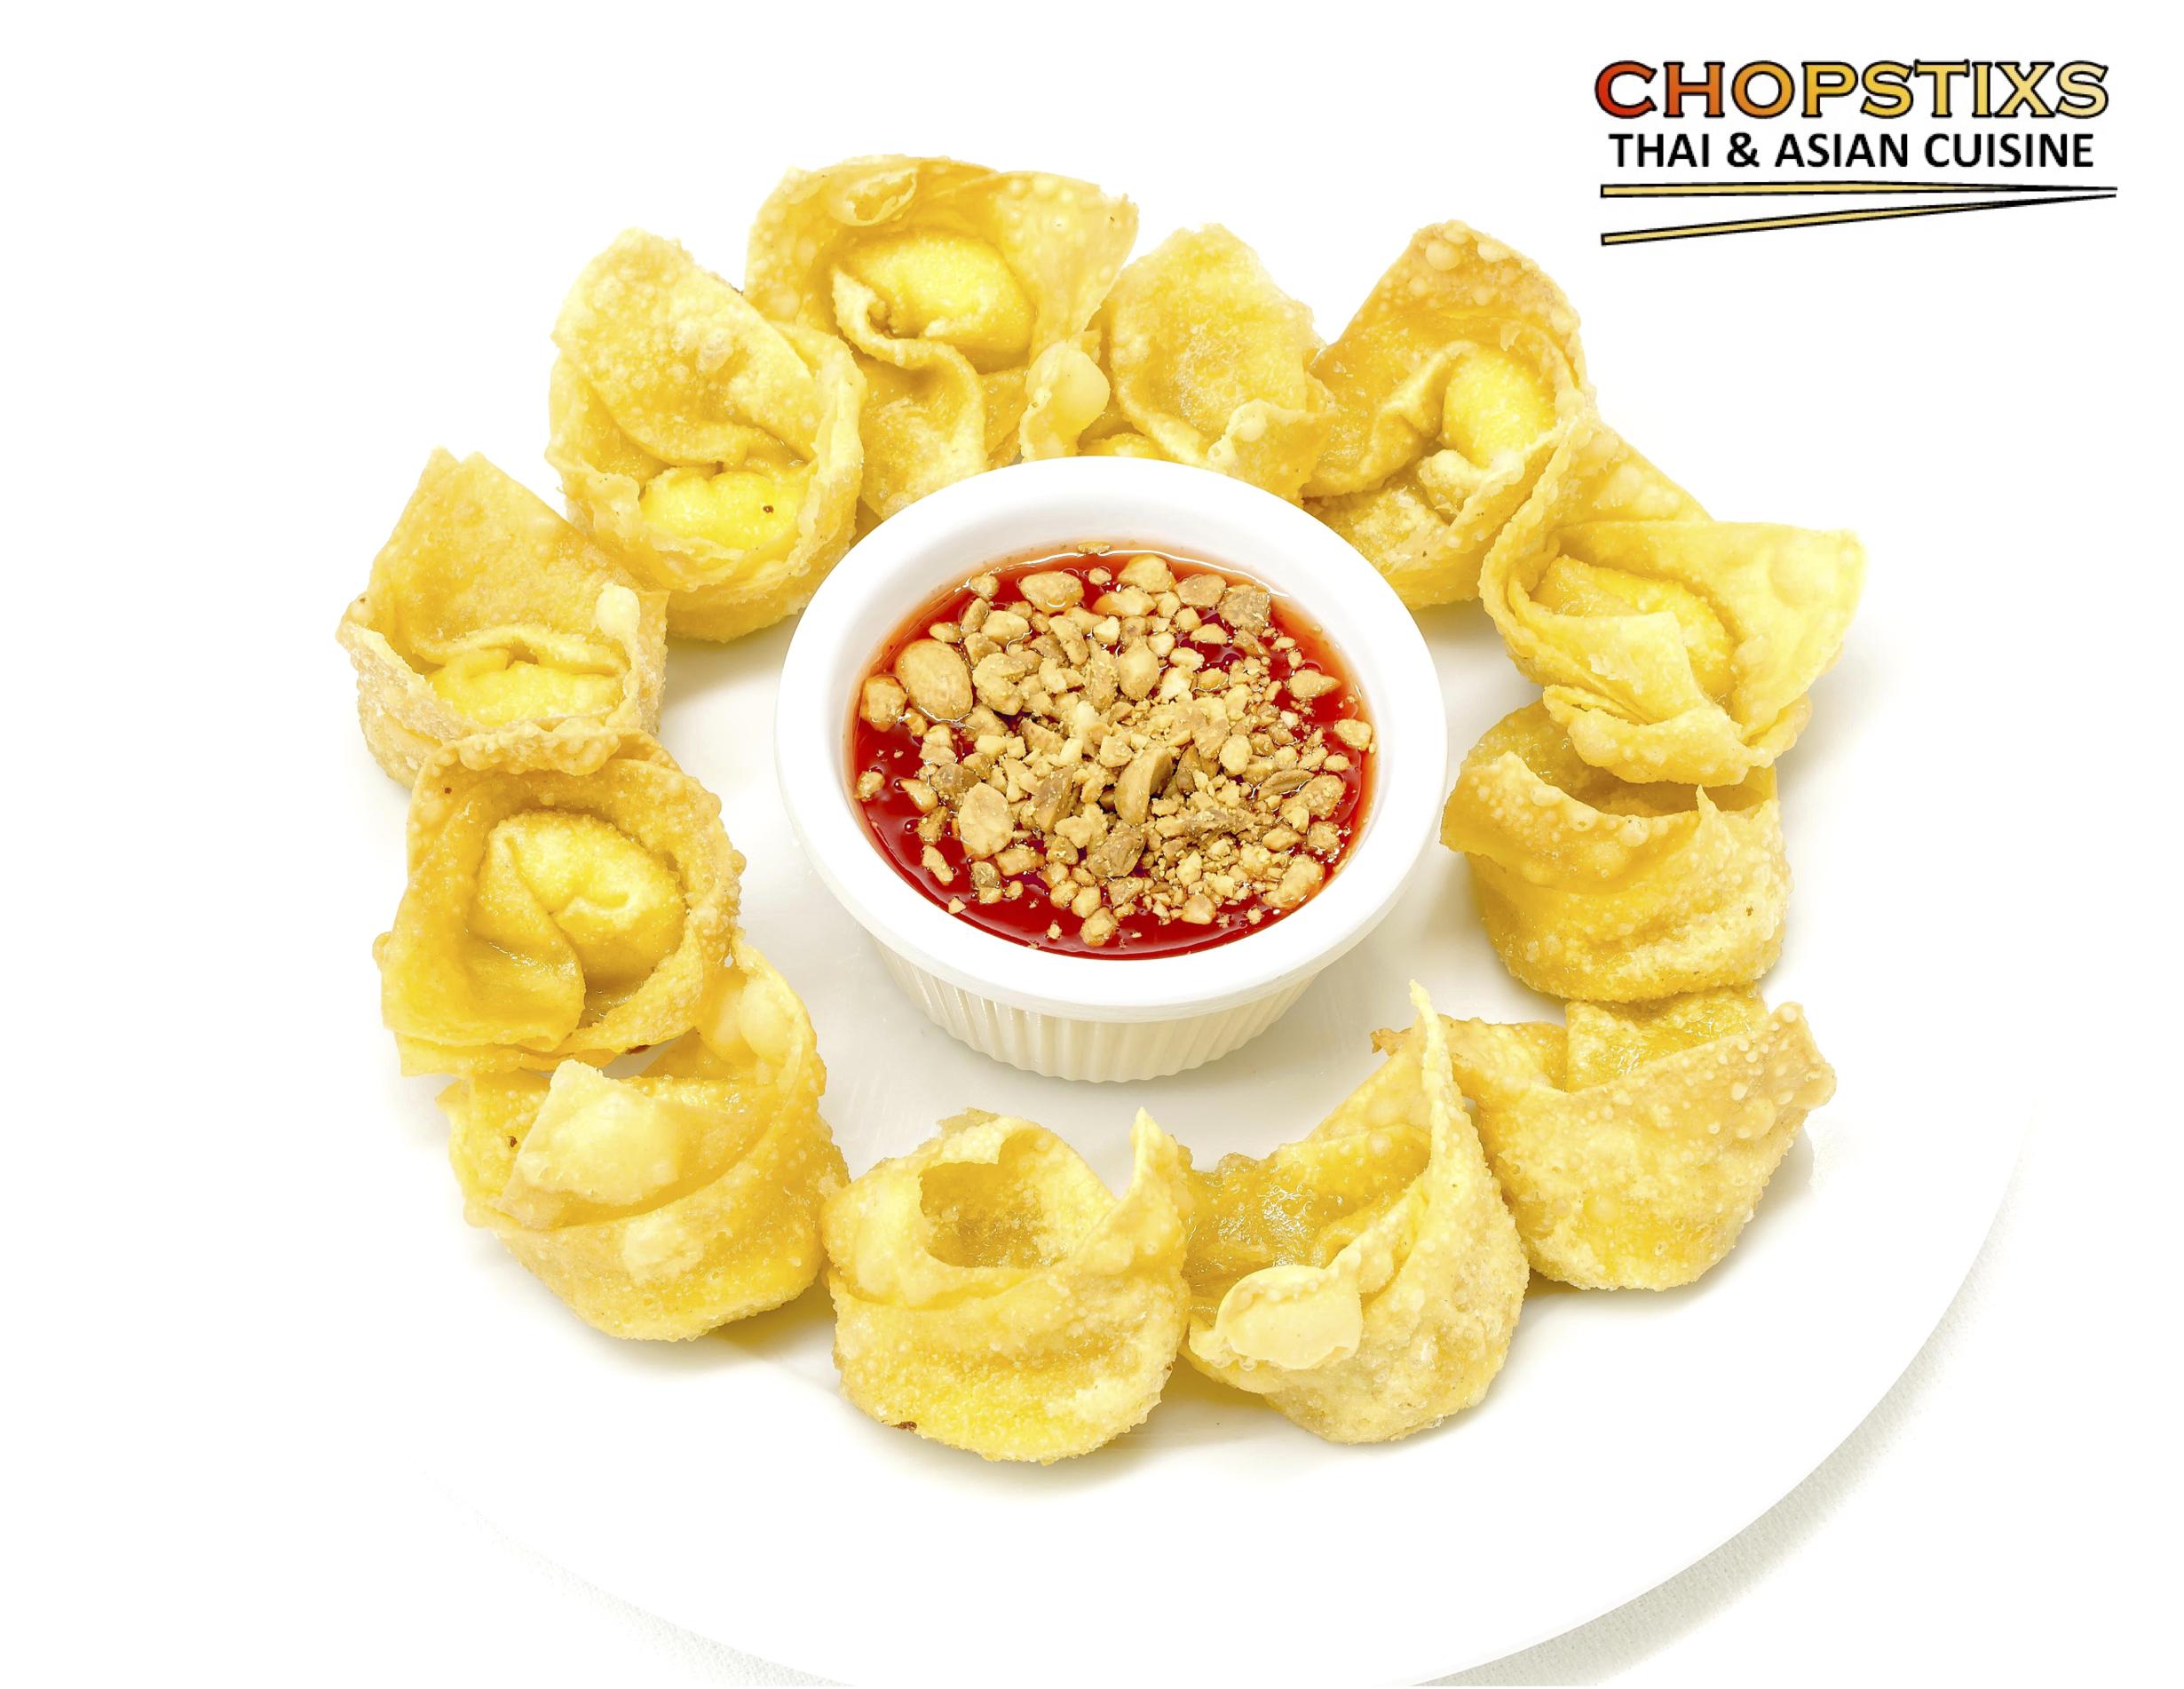 Fried Cheese Wonton (12 Pcs.) Image